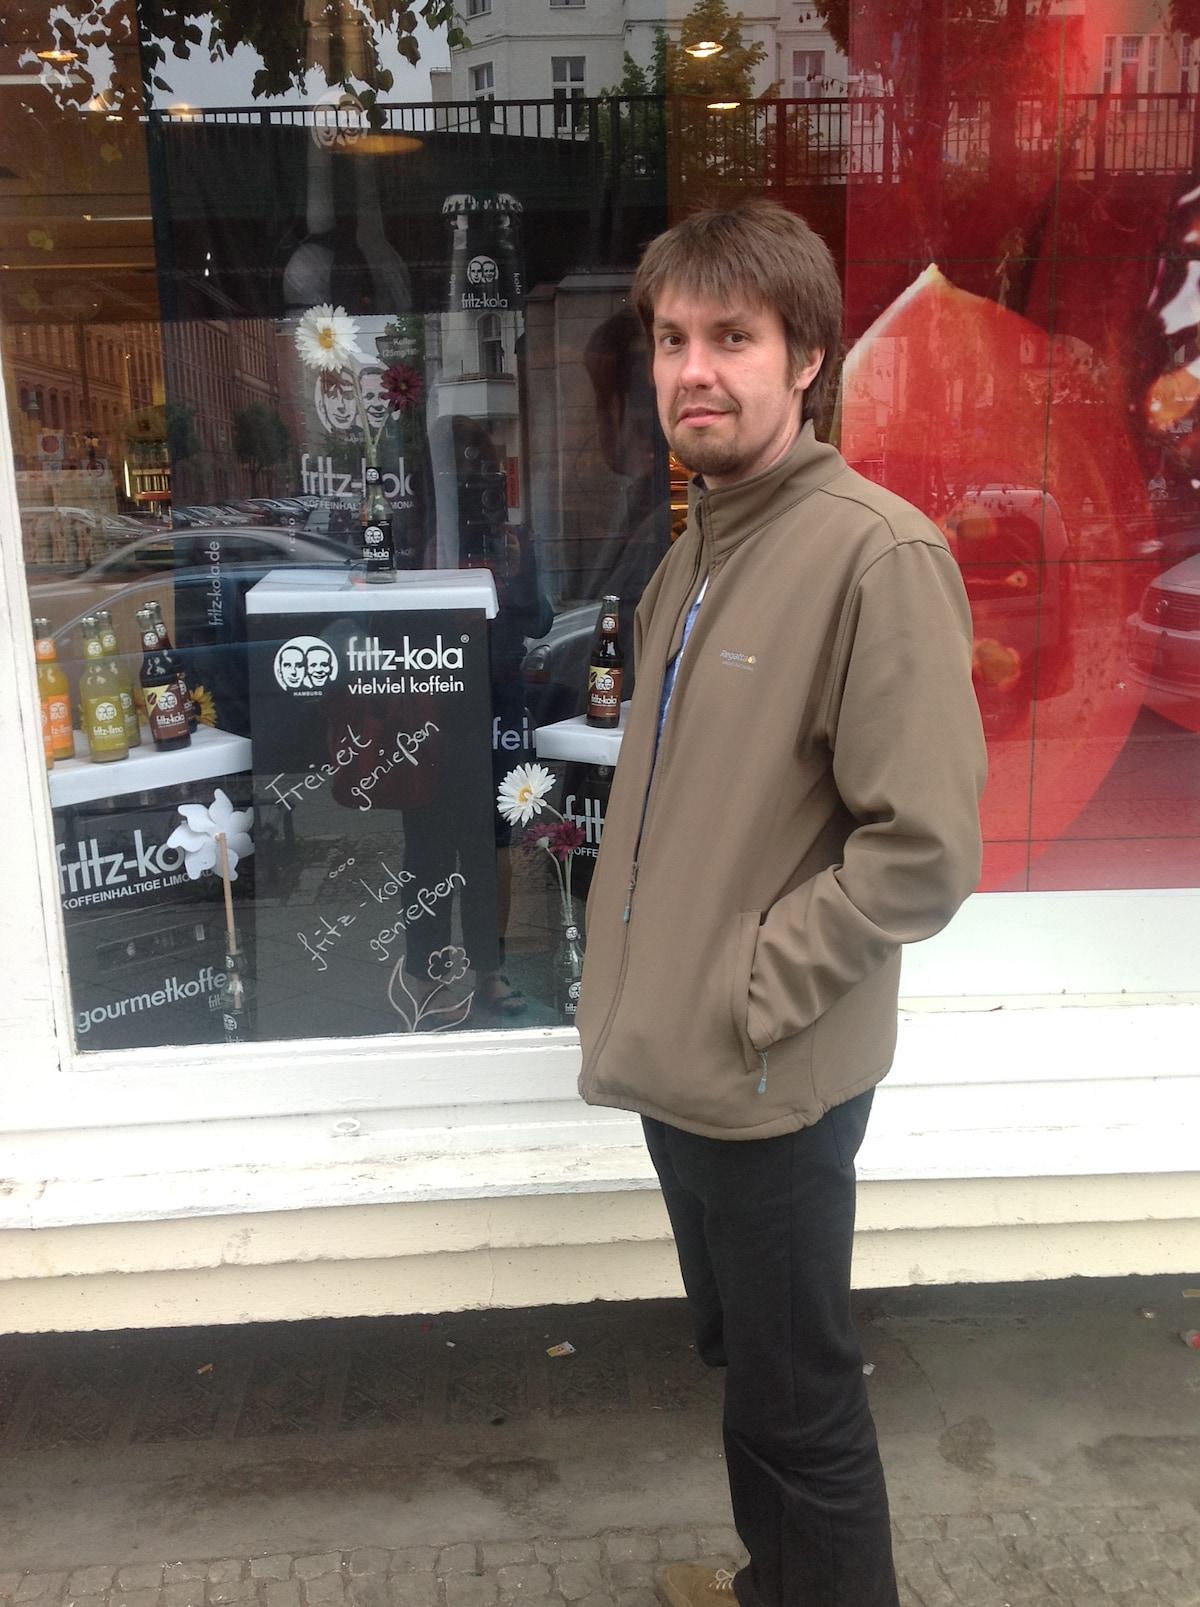 Piotr From Trowse Newton, United Kingdom